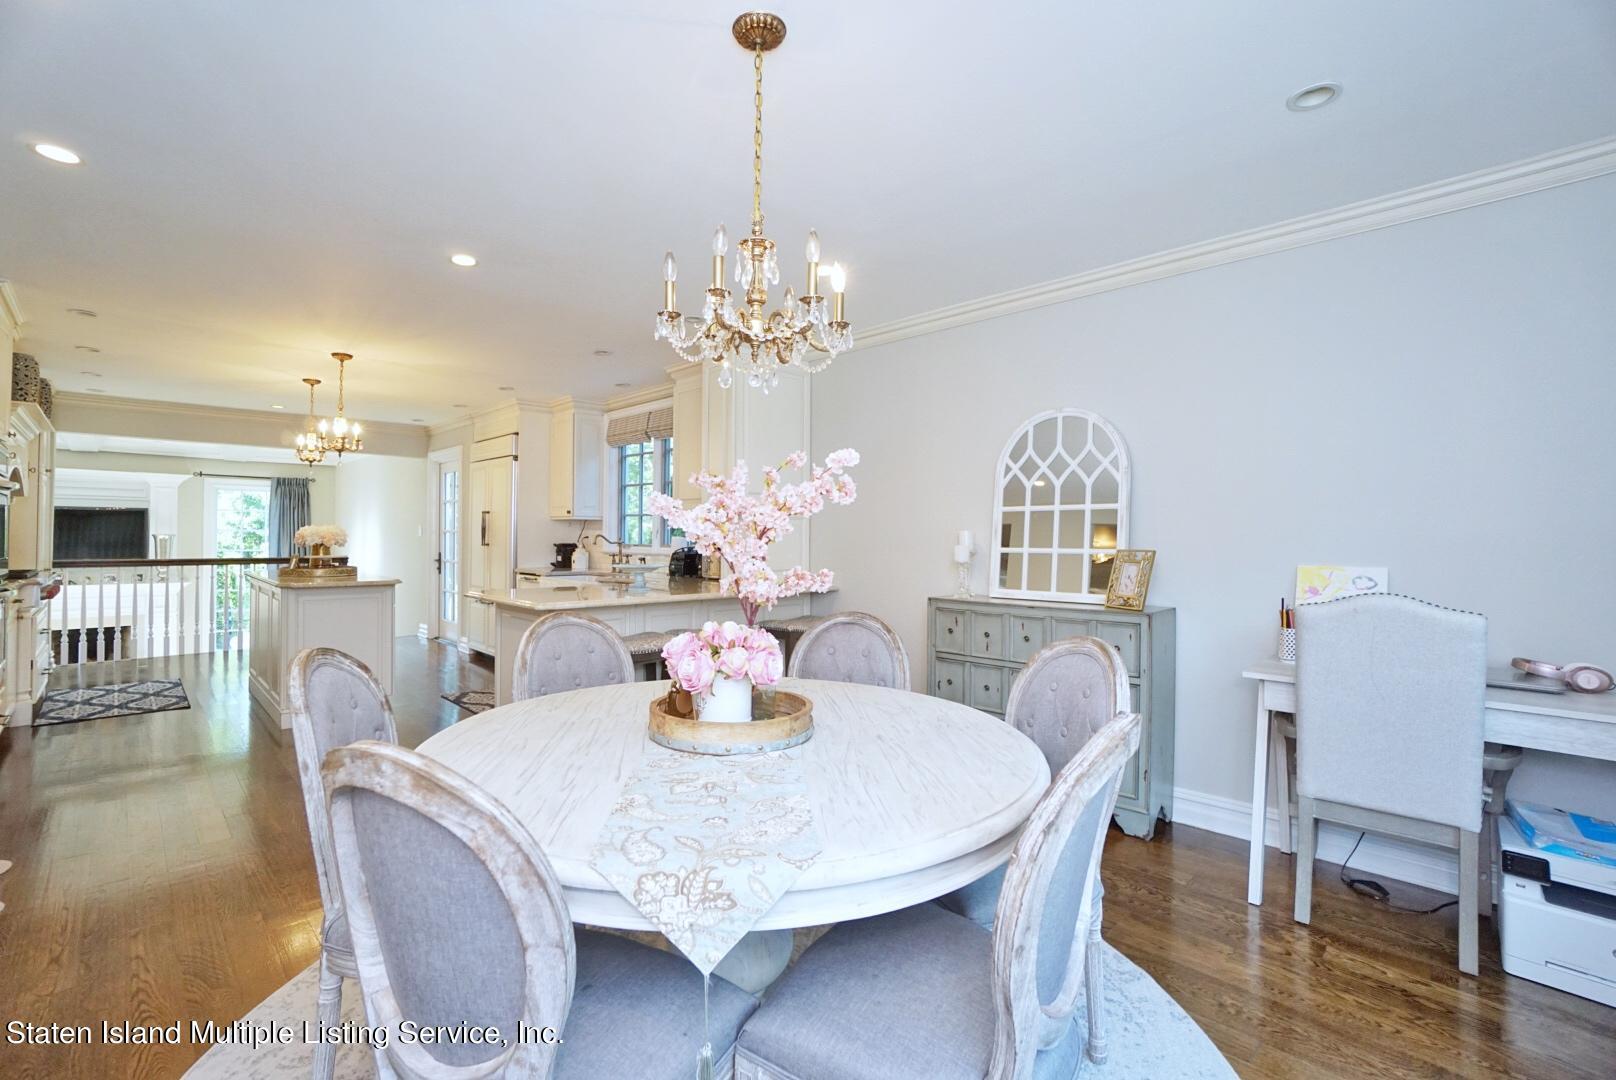 Single Family - Detached 116 Fine Blvd   Staten Island, NY 10314, MLS-1148291-16